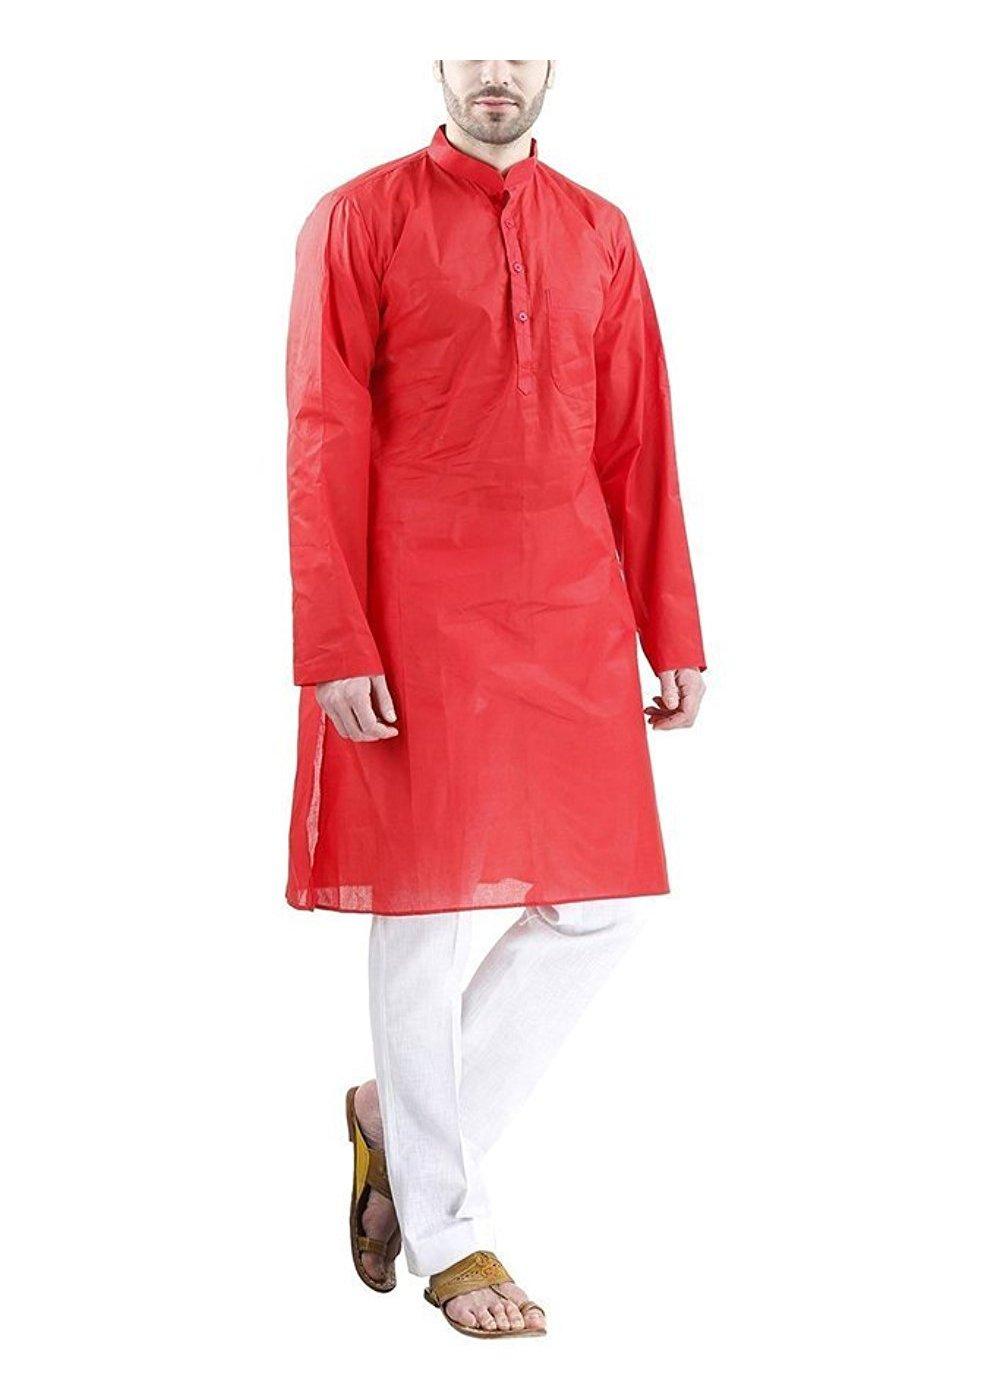 Royal Kurta Big Boy's Fine Cotton Kurta Pyjama Set For Occasion 42 Red